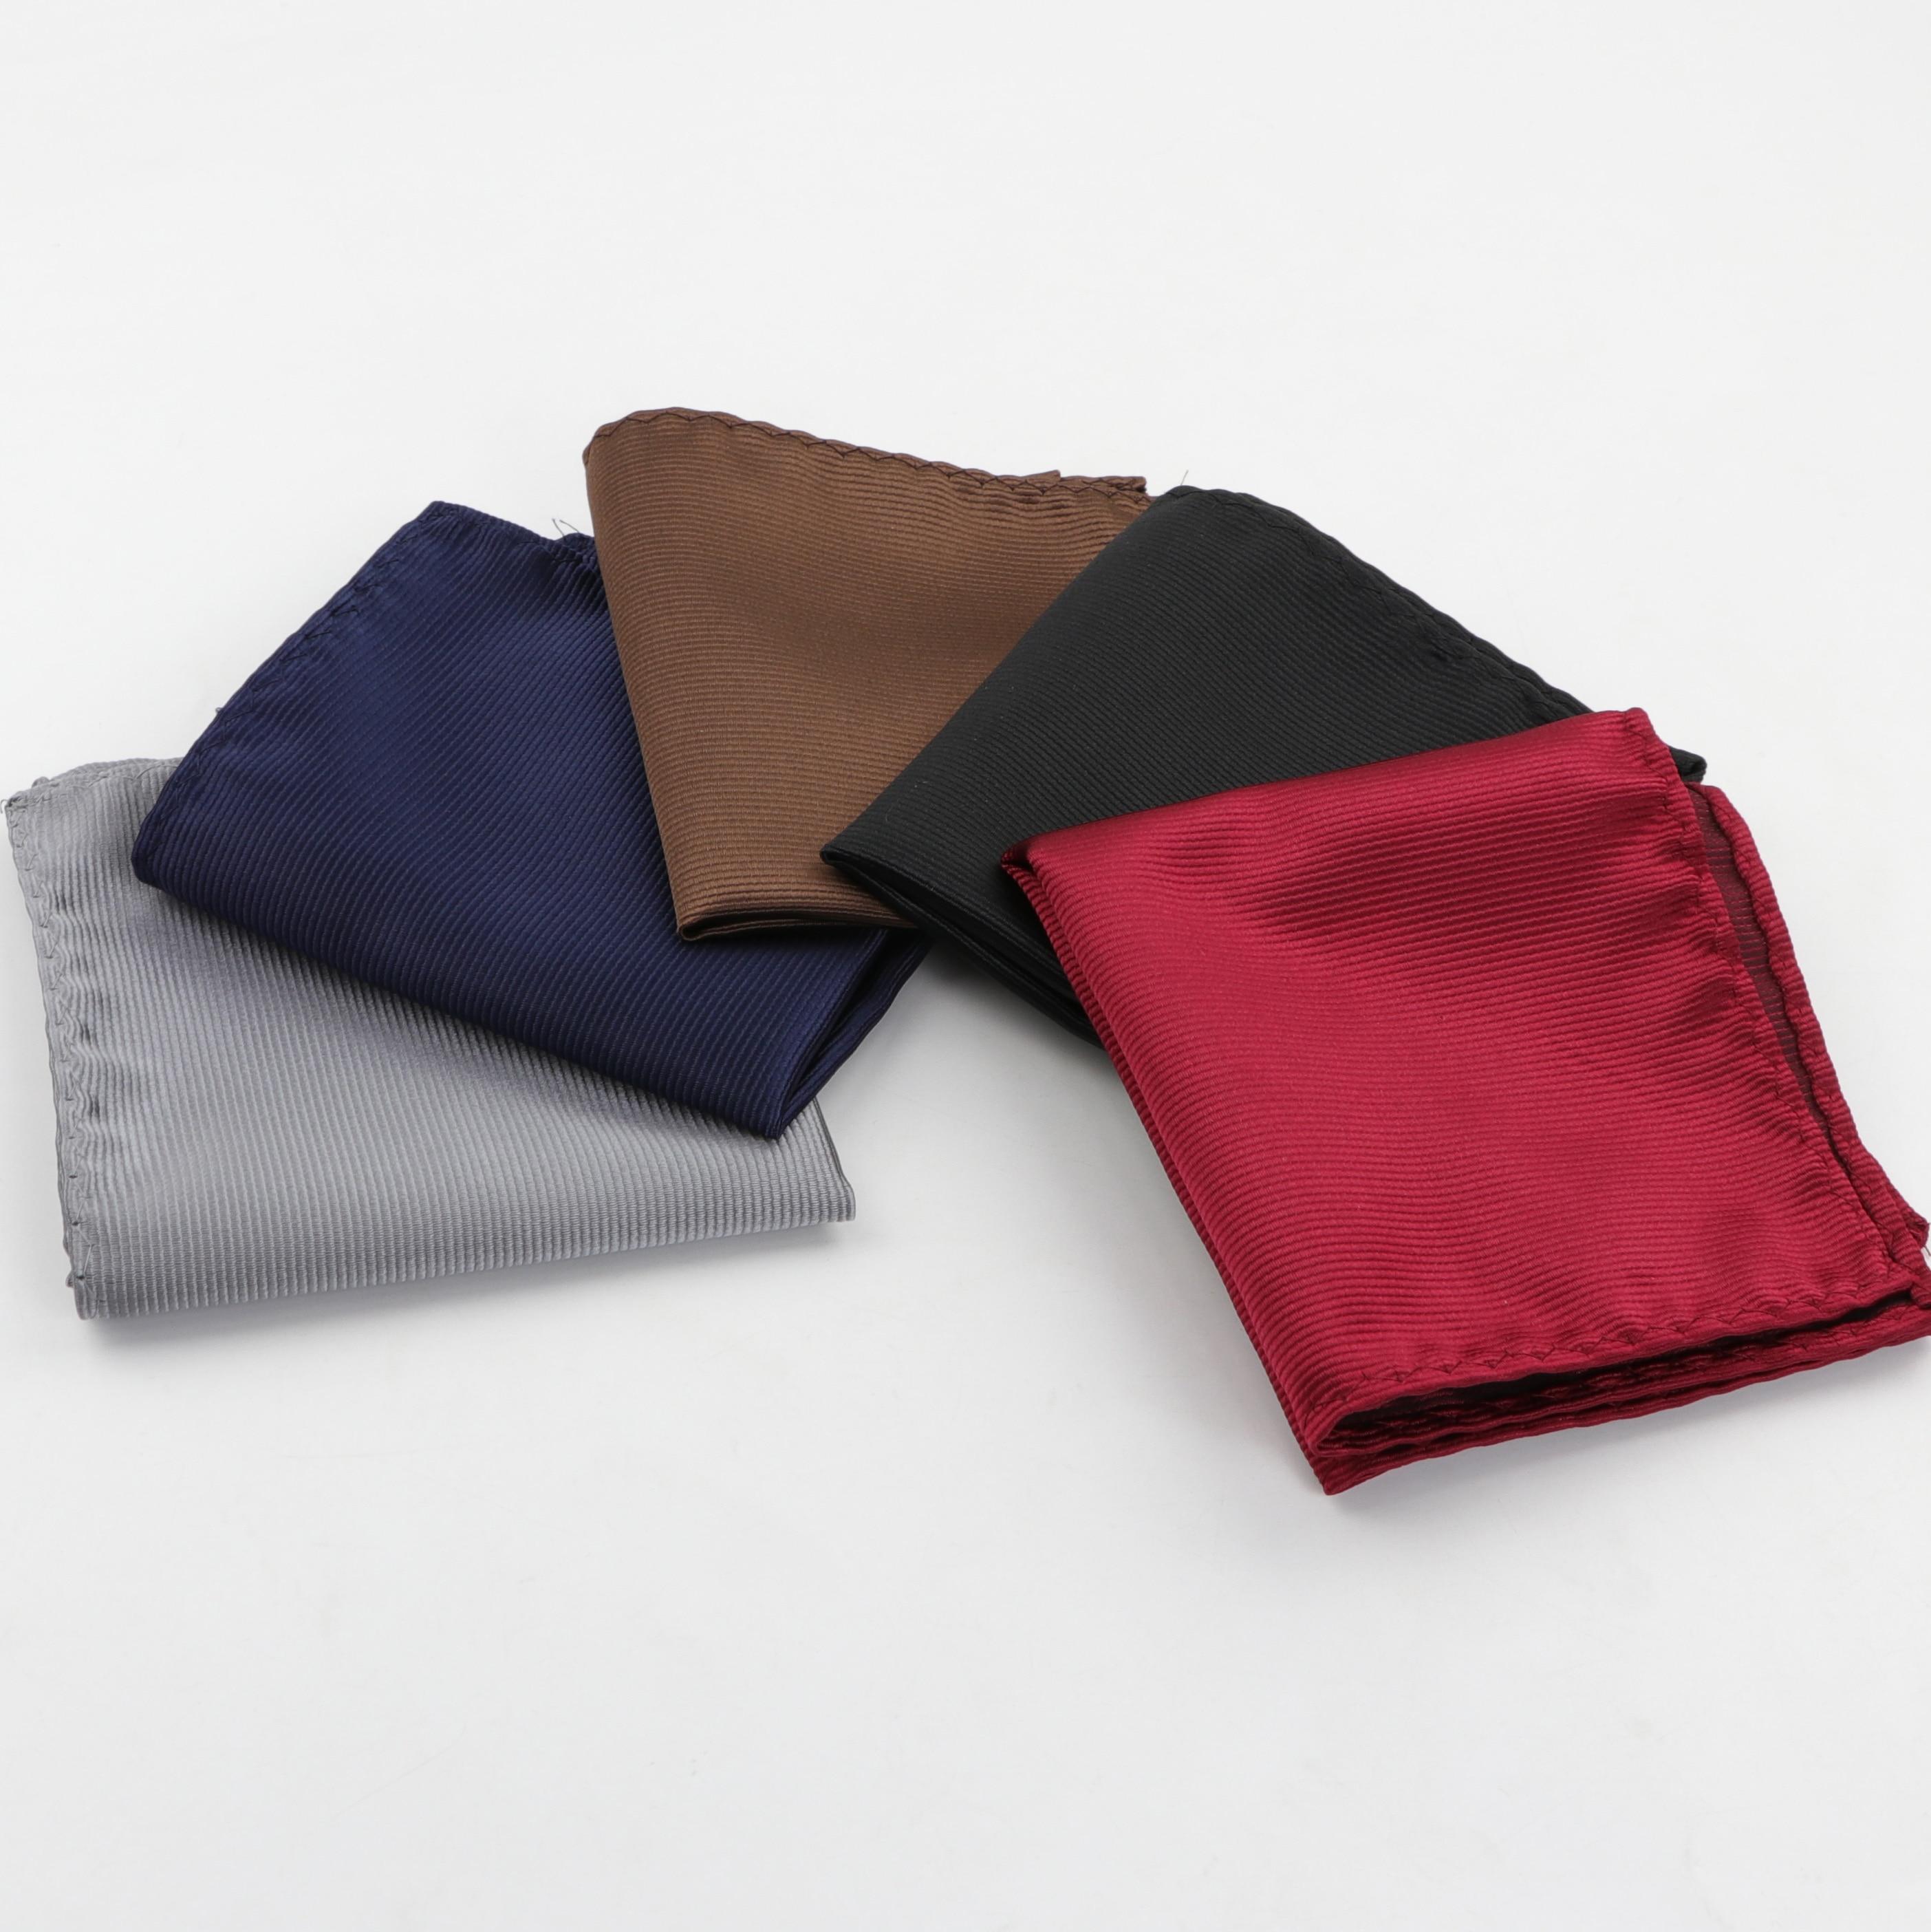 Men Suits Polyester Designer Handkerchiefs Woven Striped Pocket Square Hankies Business Casual Pockets Hanky